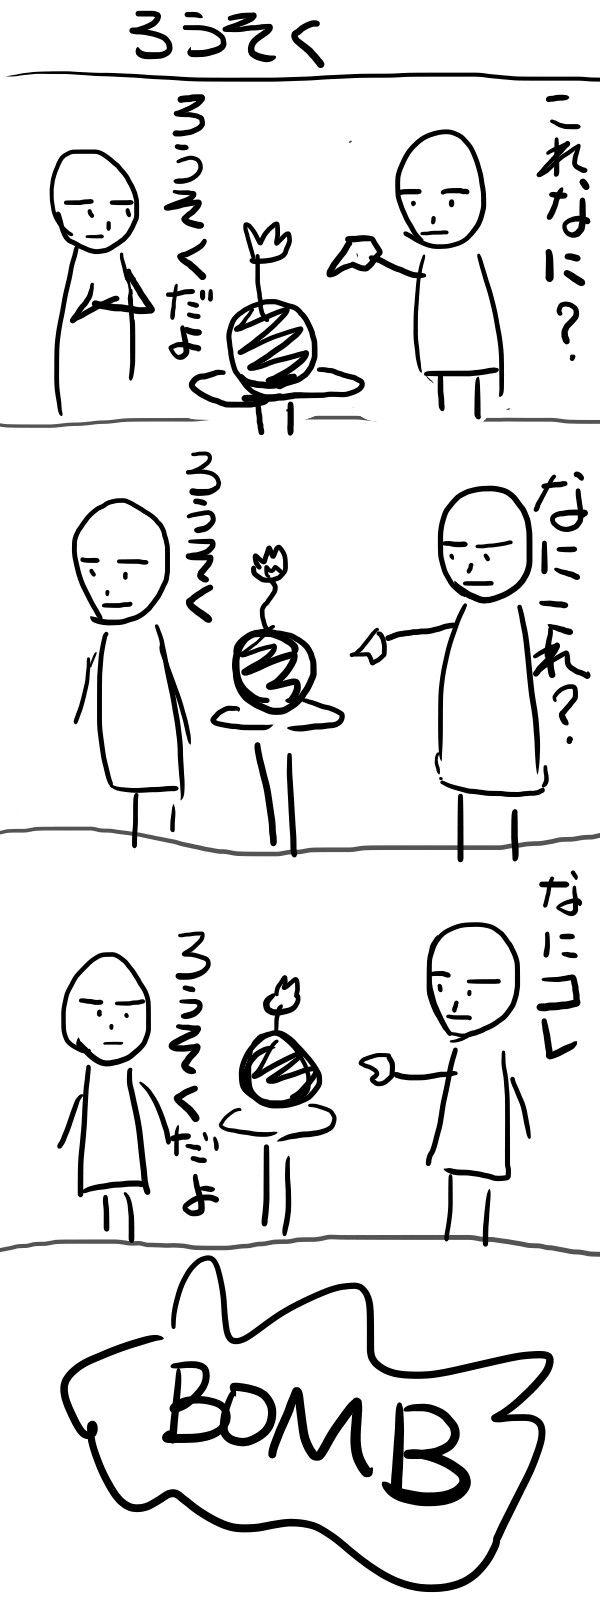 20140710100450_154_1